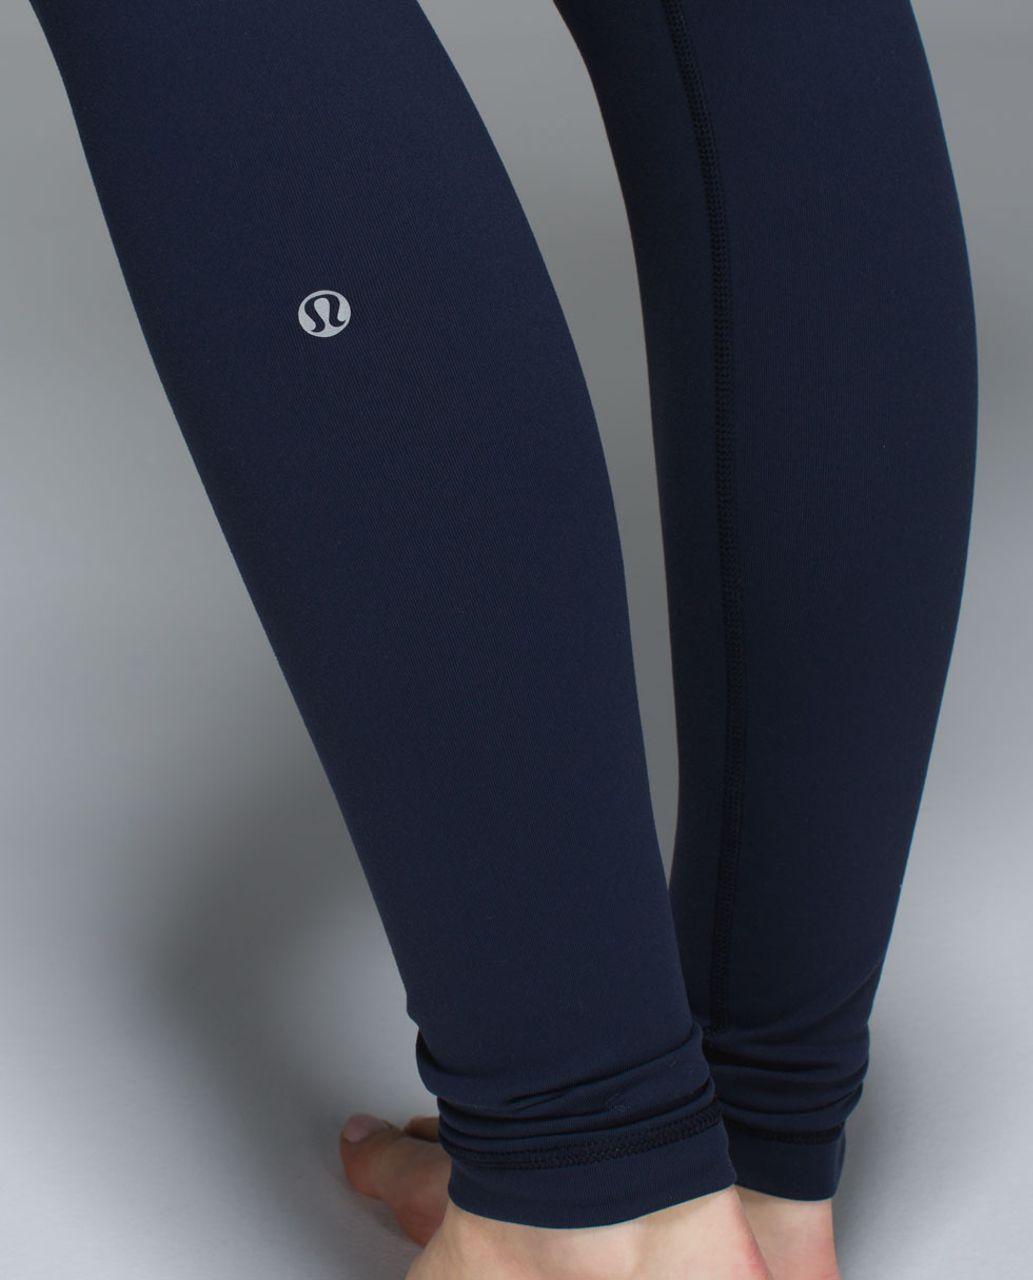 Lululemon Wunder Under Pant *Full-On Luon - Inkwell / Wi14 Quilt 1